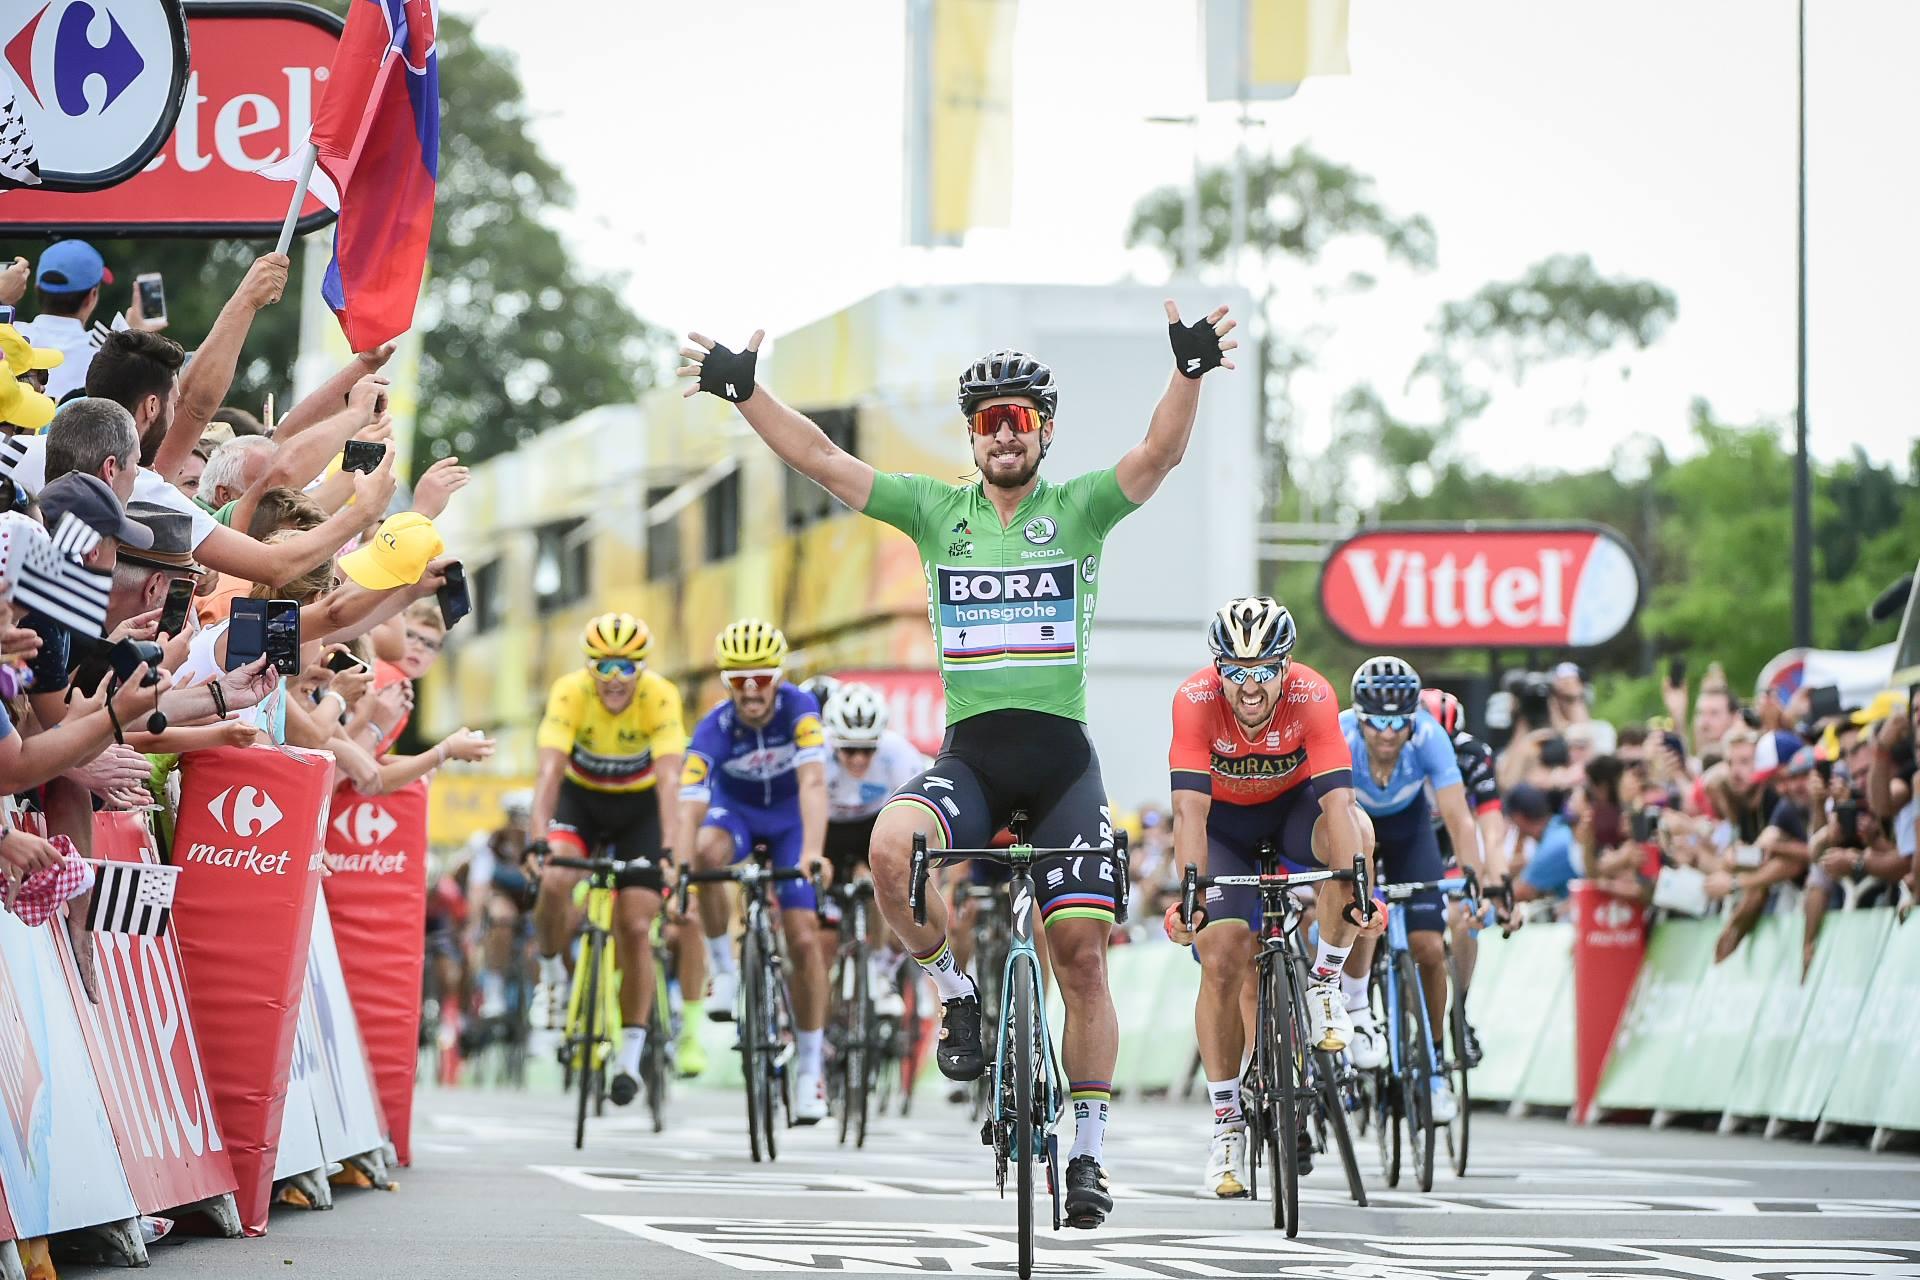 Peter Sagan anticipa Sonny Colbrelli nella quinta tappa del Tour de France 2018